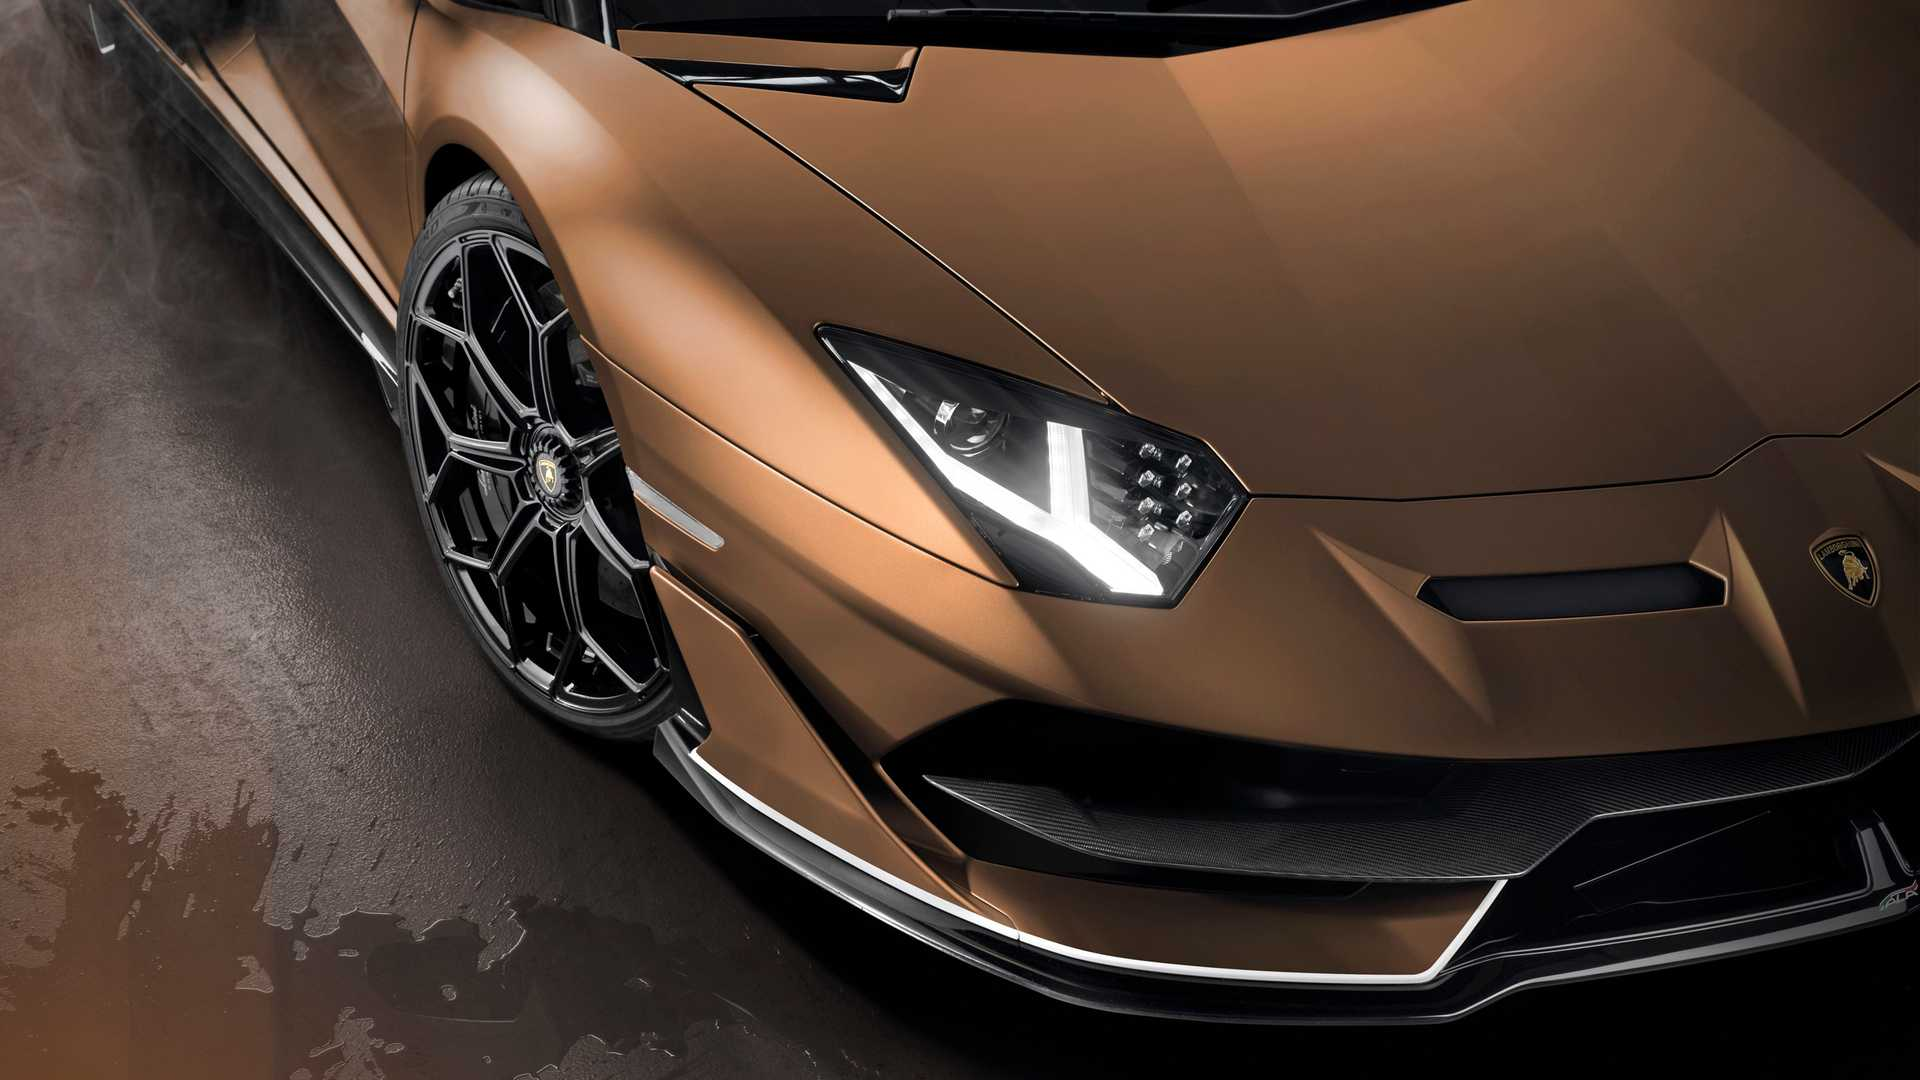 2020 Lamborghini Aventador SVJ Roadster Headlight Wallpapers #23 of 35